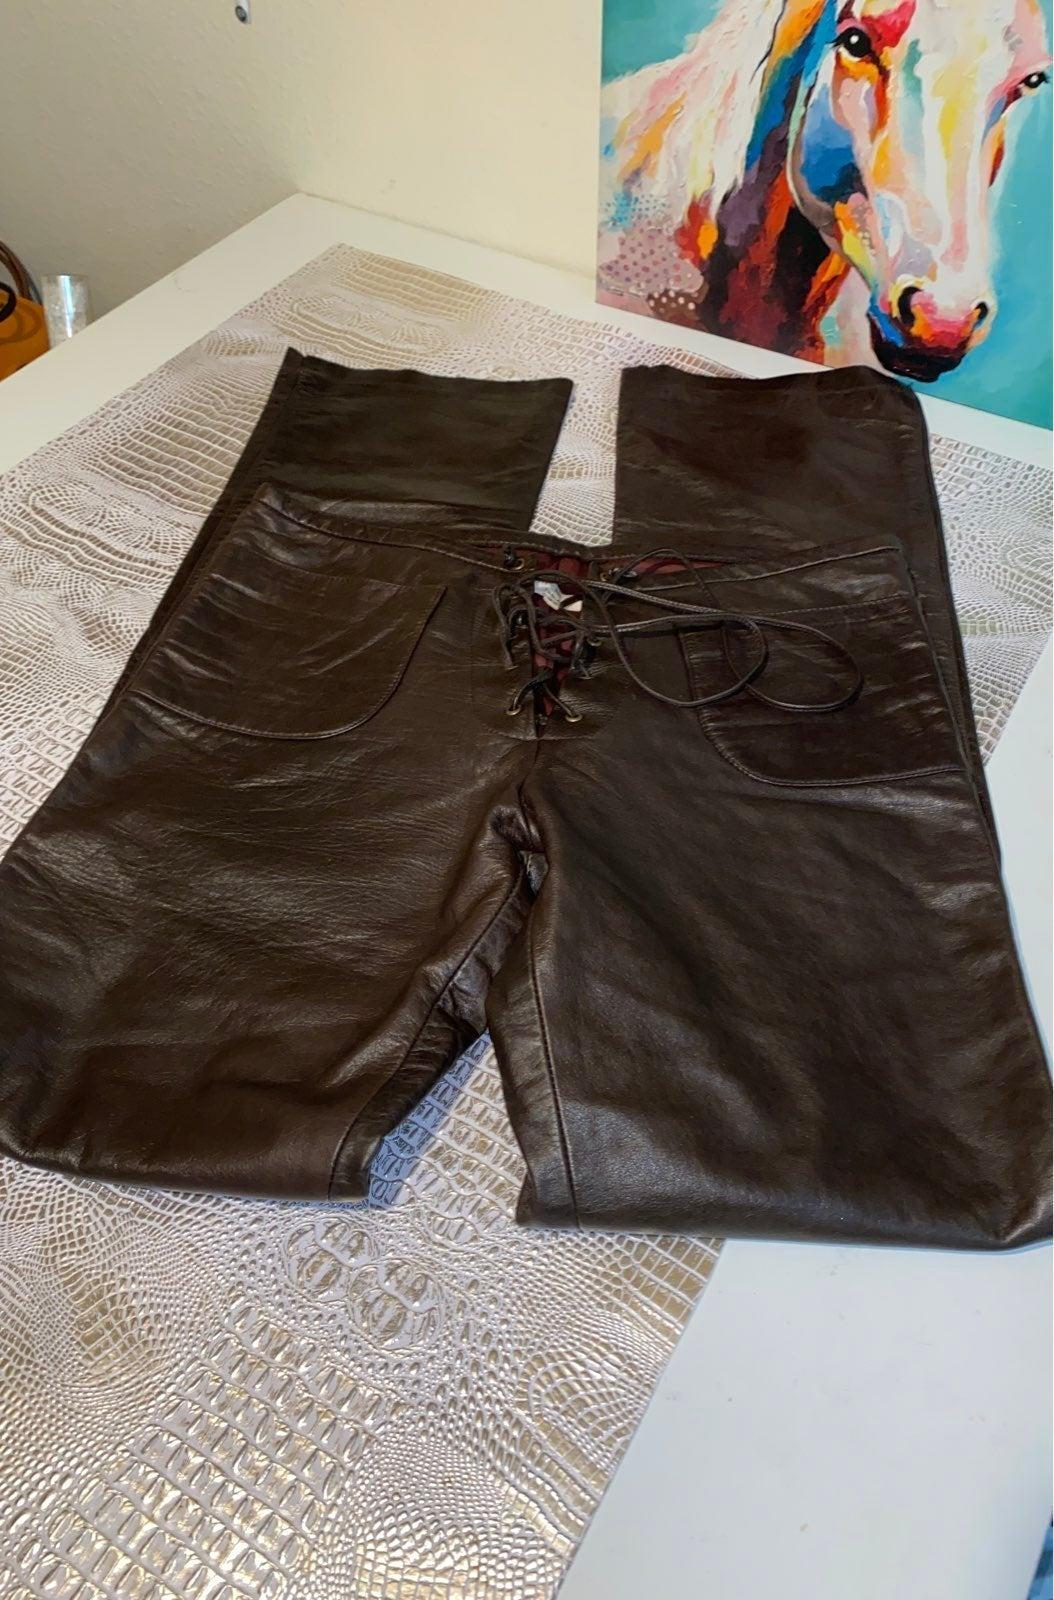 Vintage leather pants by John Cherpas